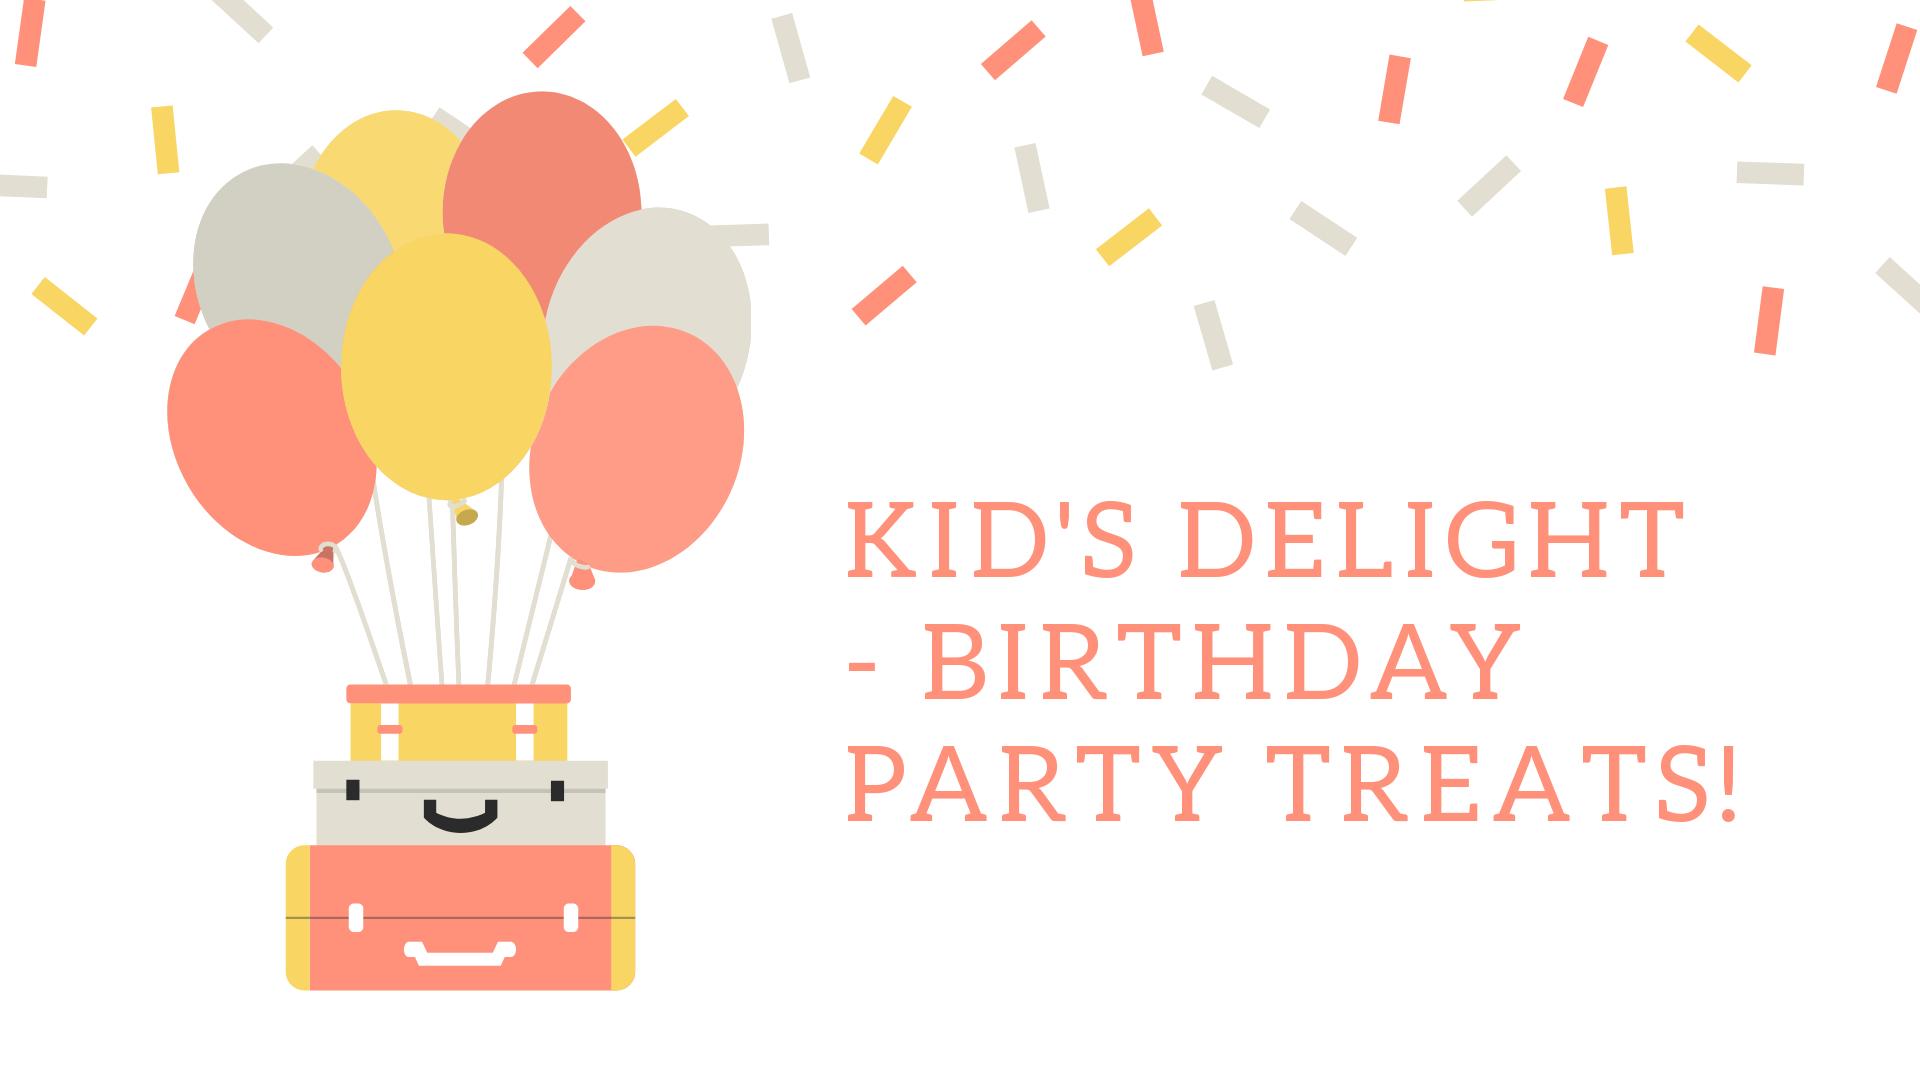 kids delight event - birthday party treats